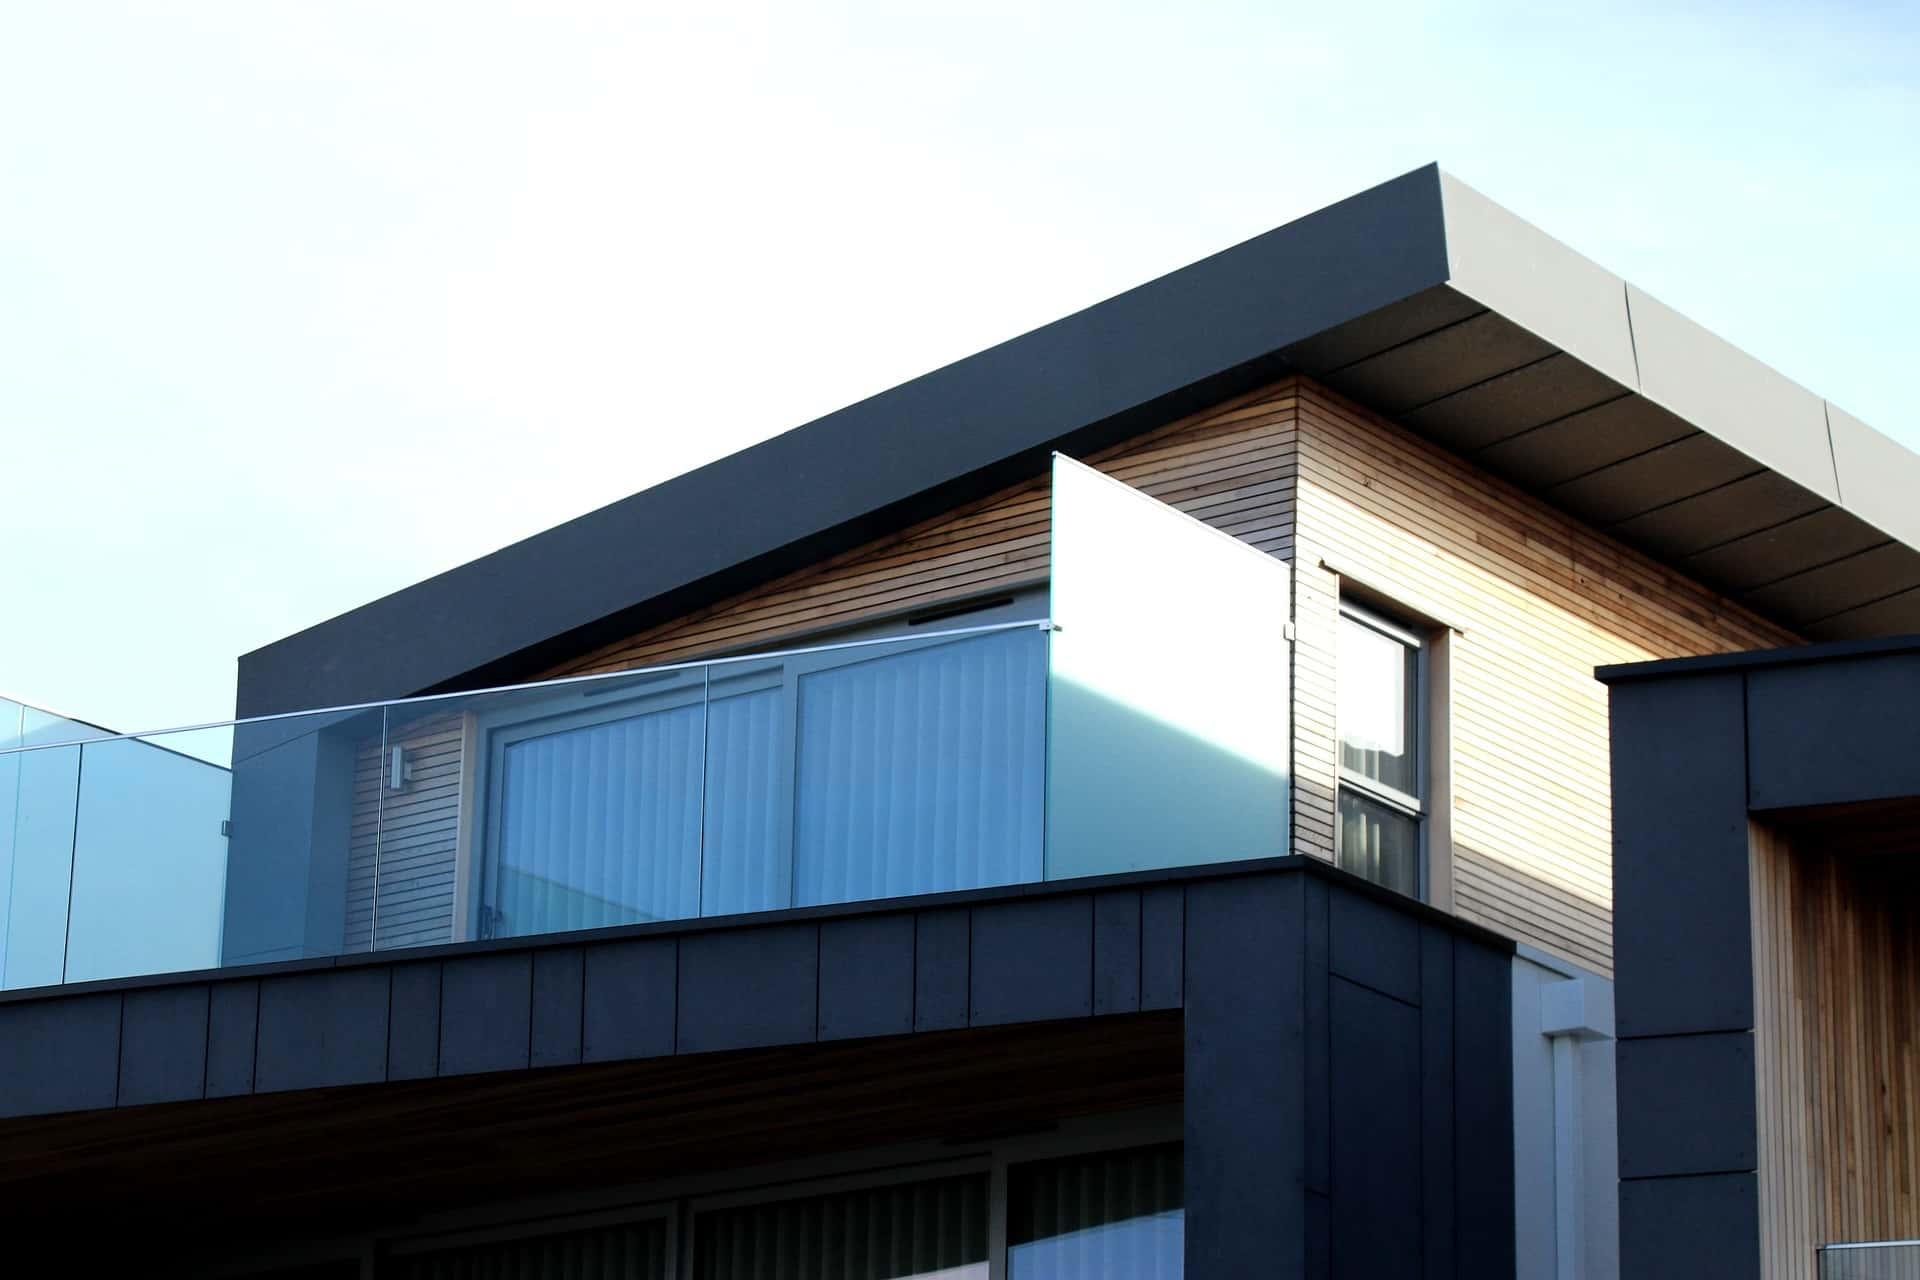 modern architecture using glass railings